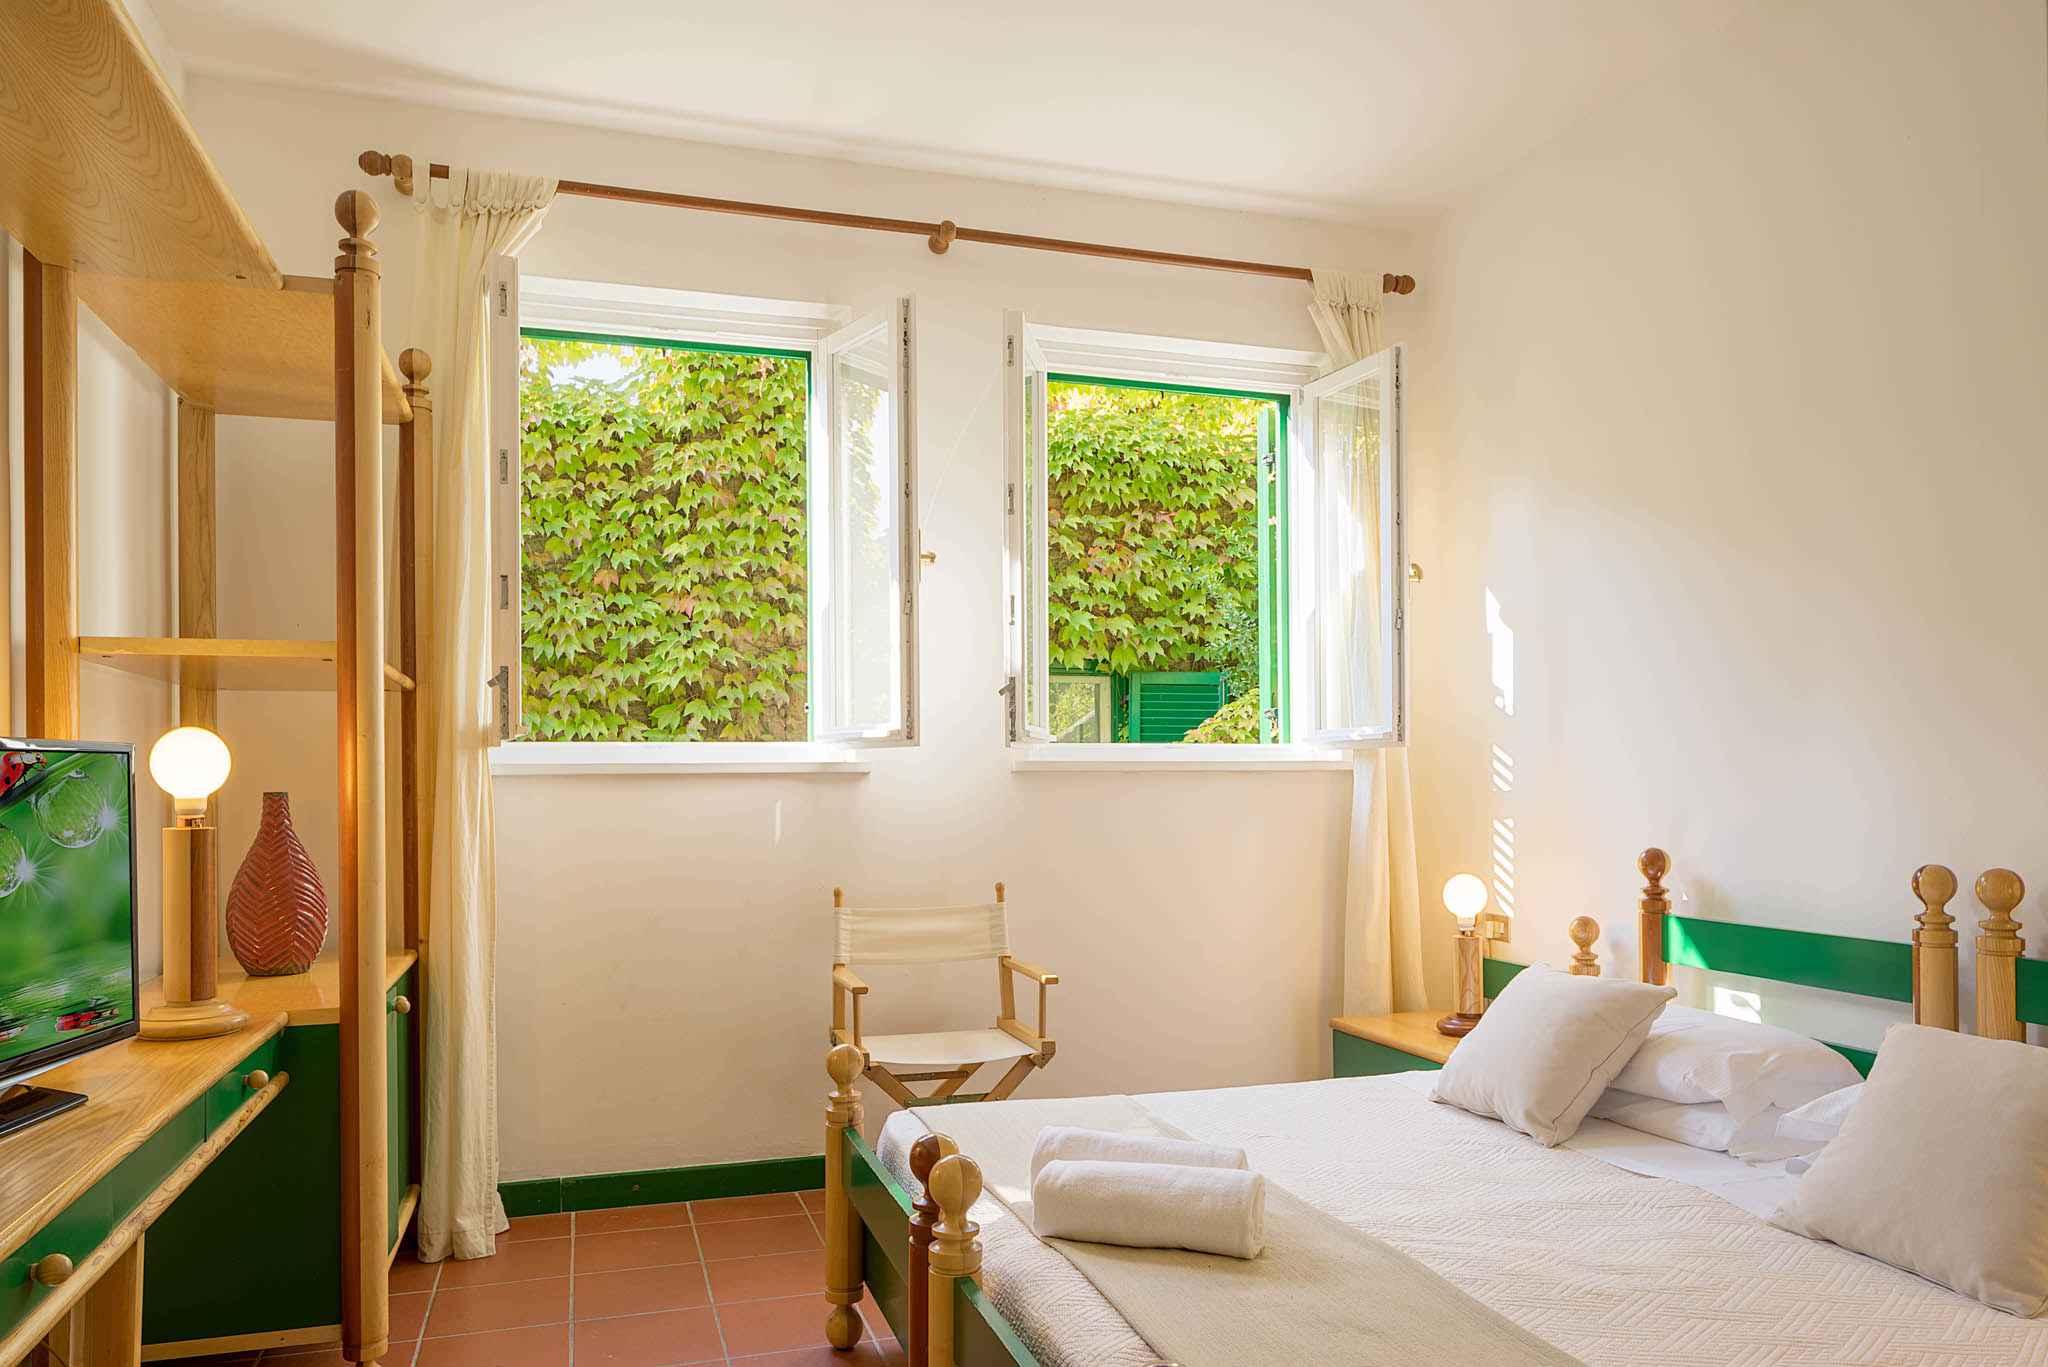 Ferienwohnung Residence Sant'Anna del Volterraio (403209), Rio Nell'Elba, Elba, Toskana, Italien, Bild 12